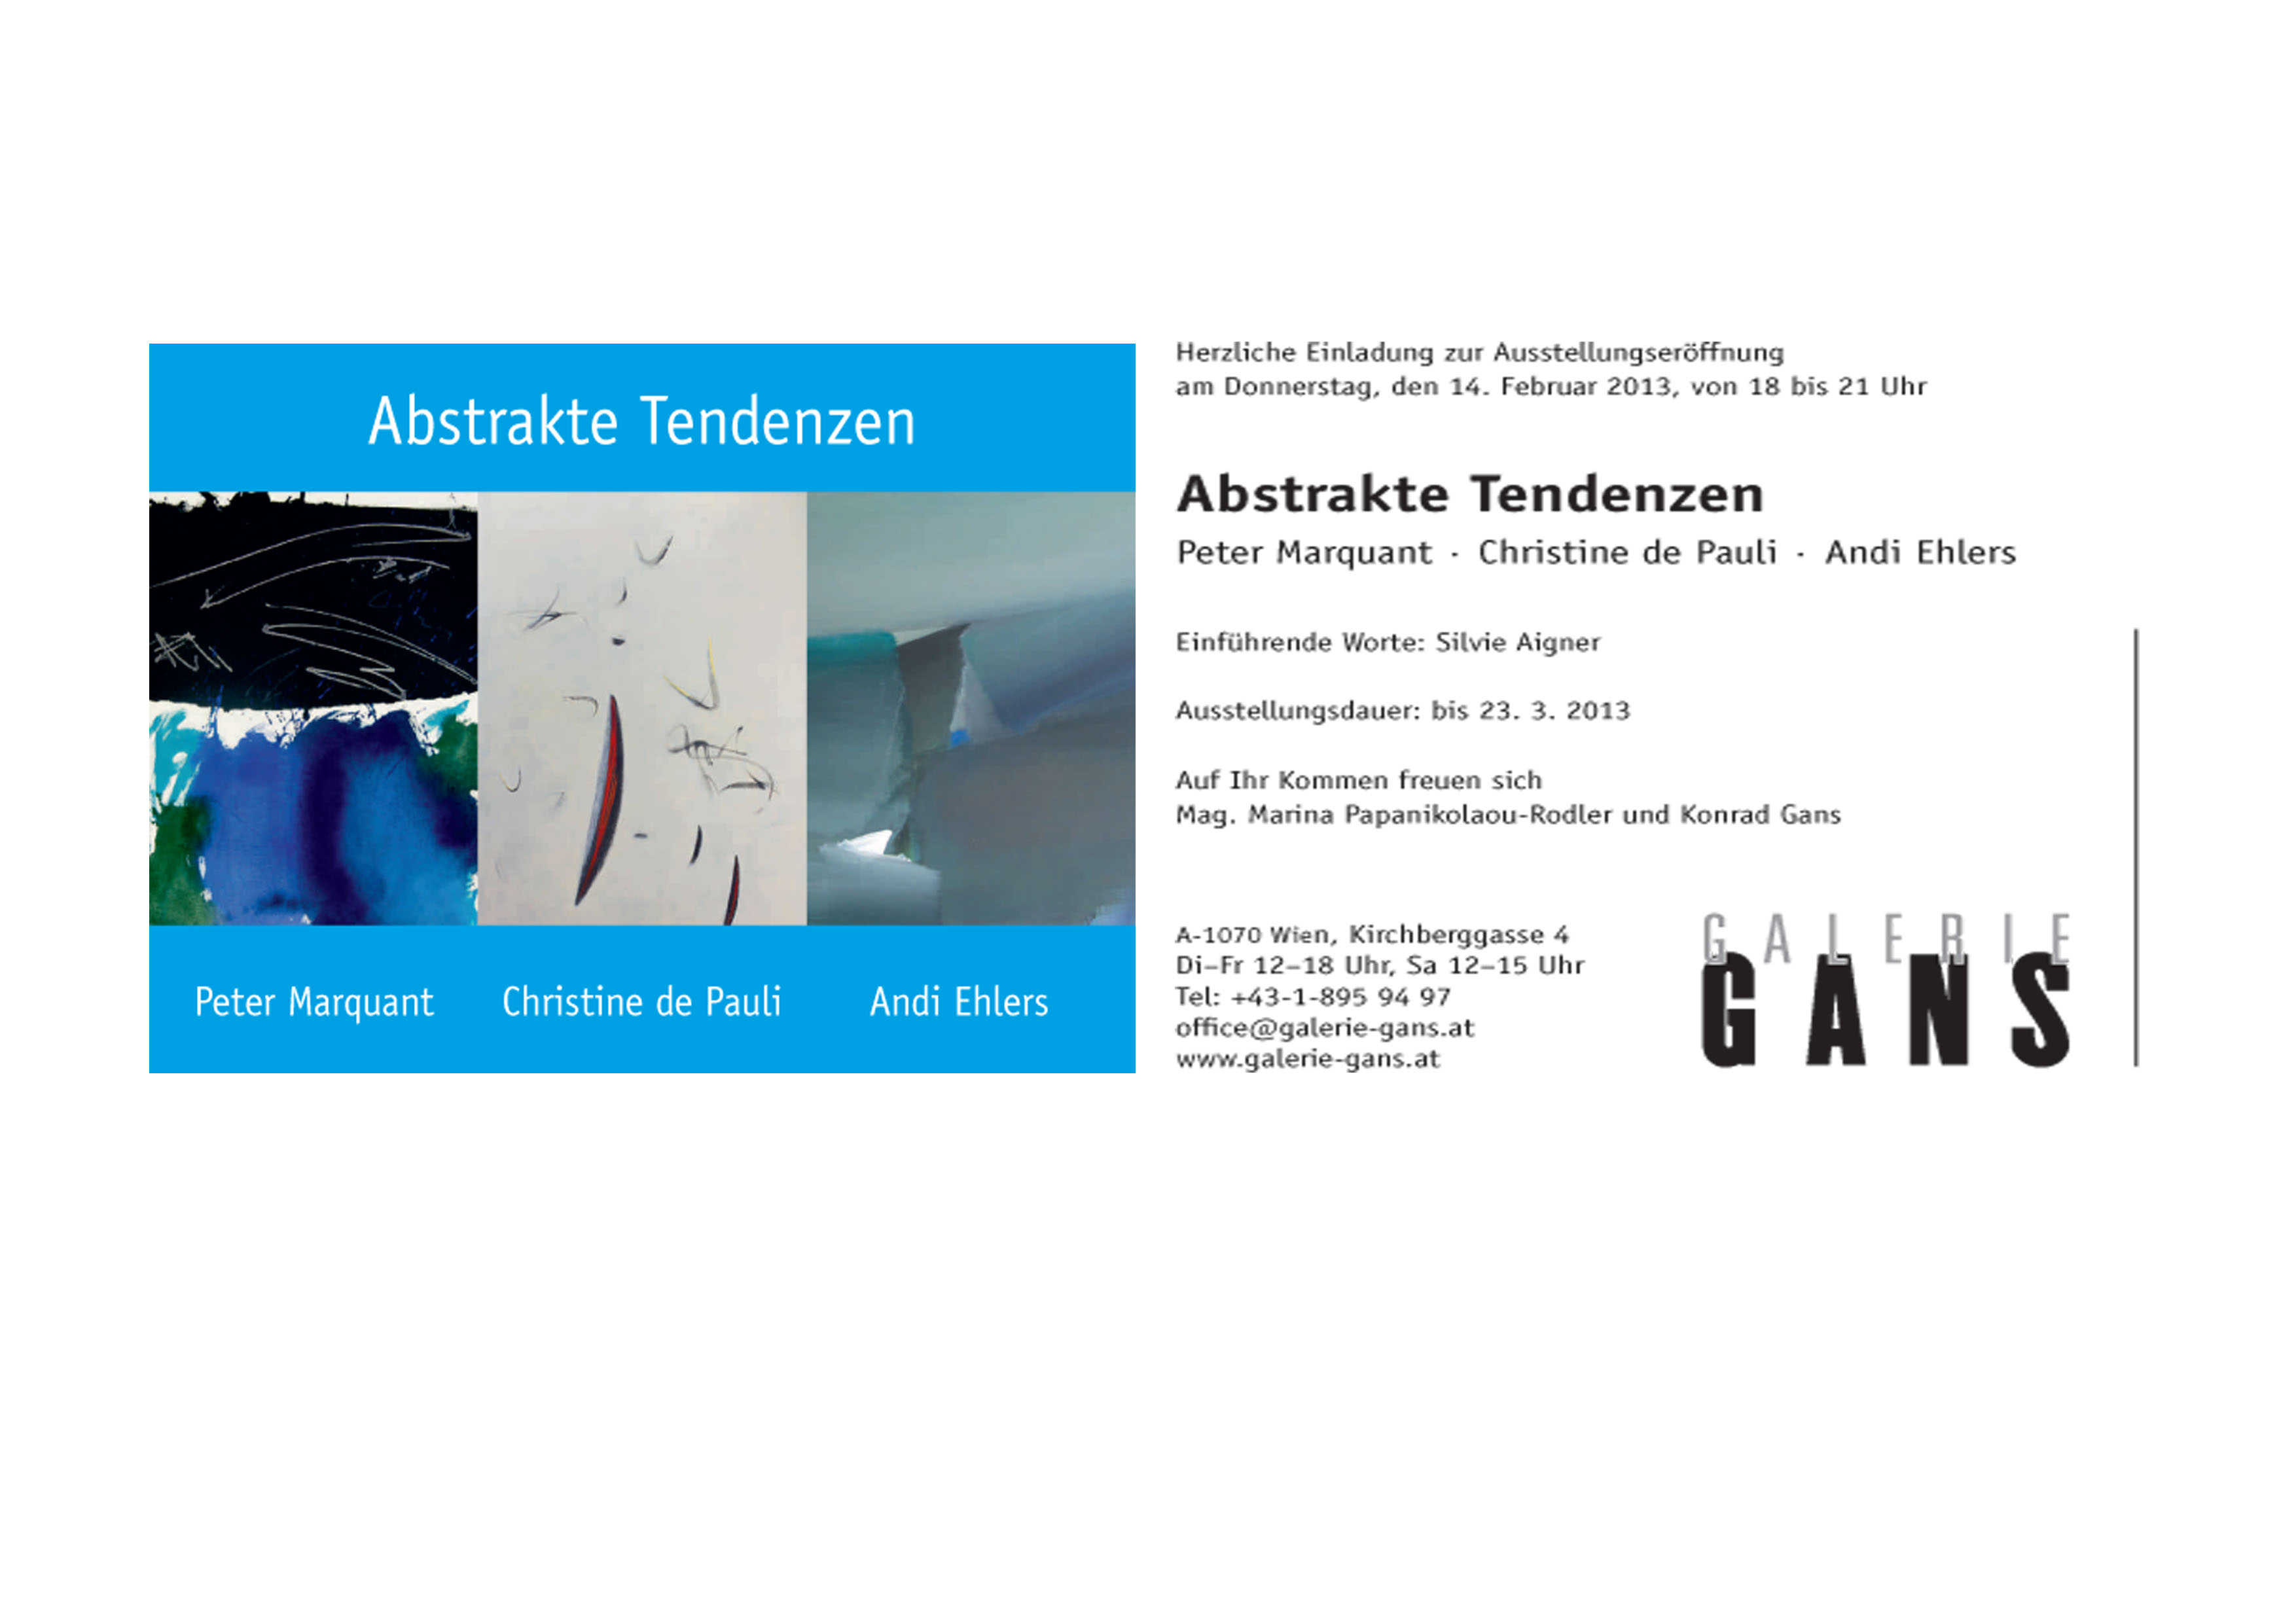 Exposición colectiva: Abstrakte tendenzen. Peter Marquant. Christine de Pauli. Andi Ehlers. Galerie Gans. Viena